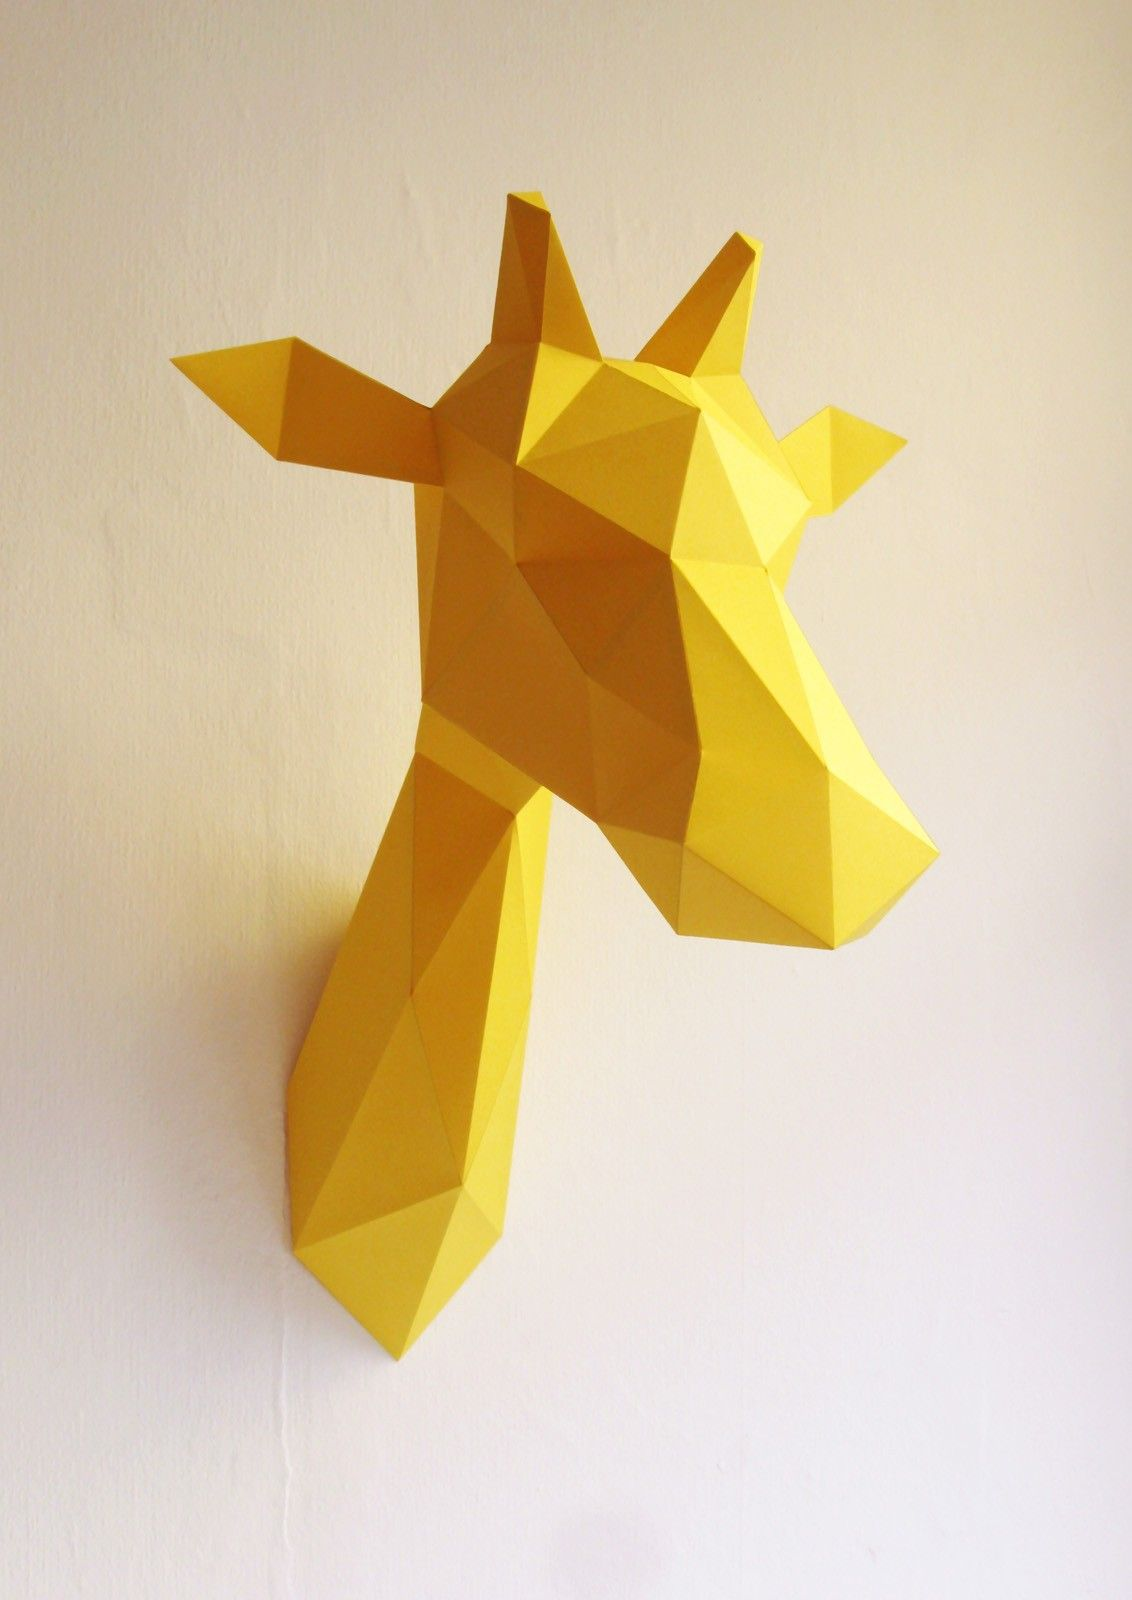 Origami en papier, tête de girafe jaune. - Origami paper ... - photo#19